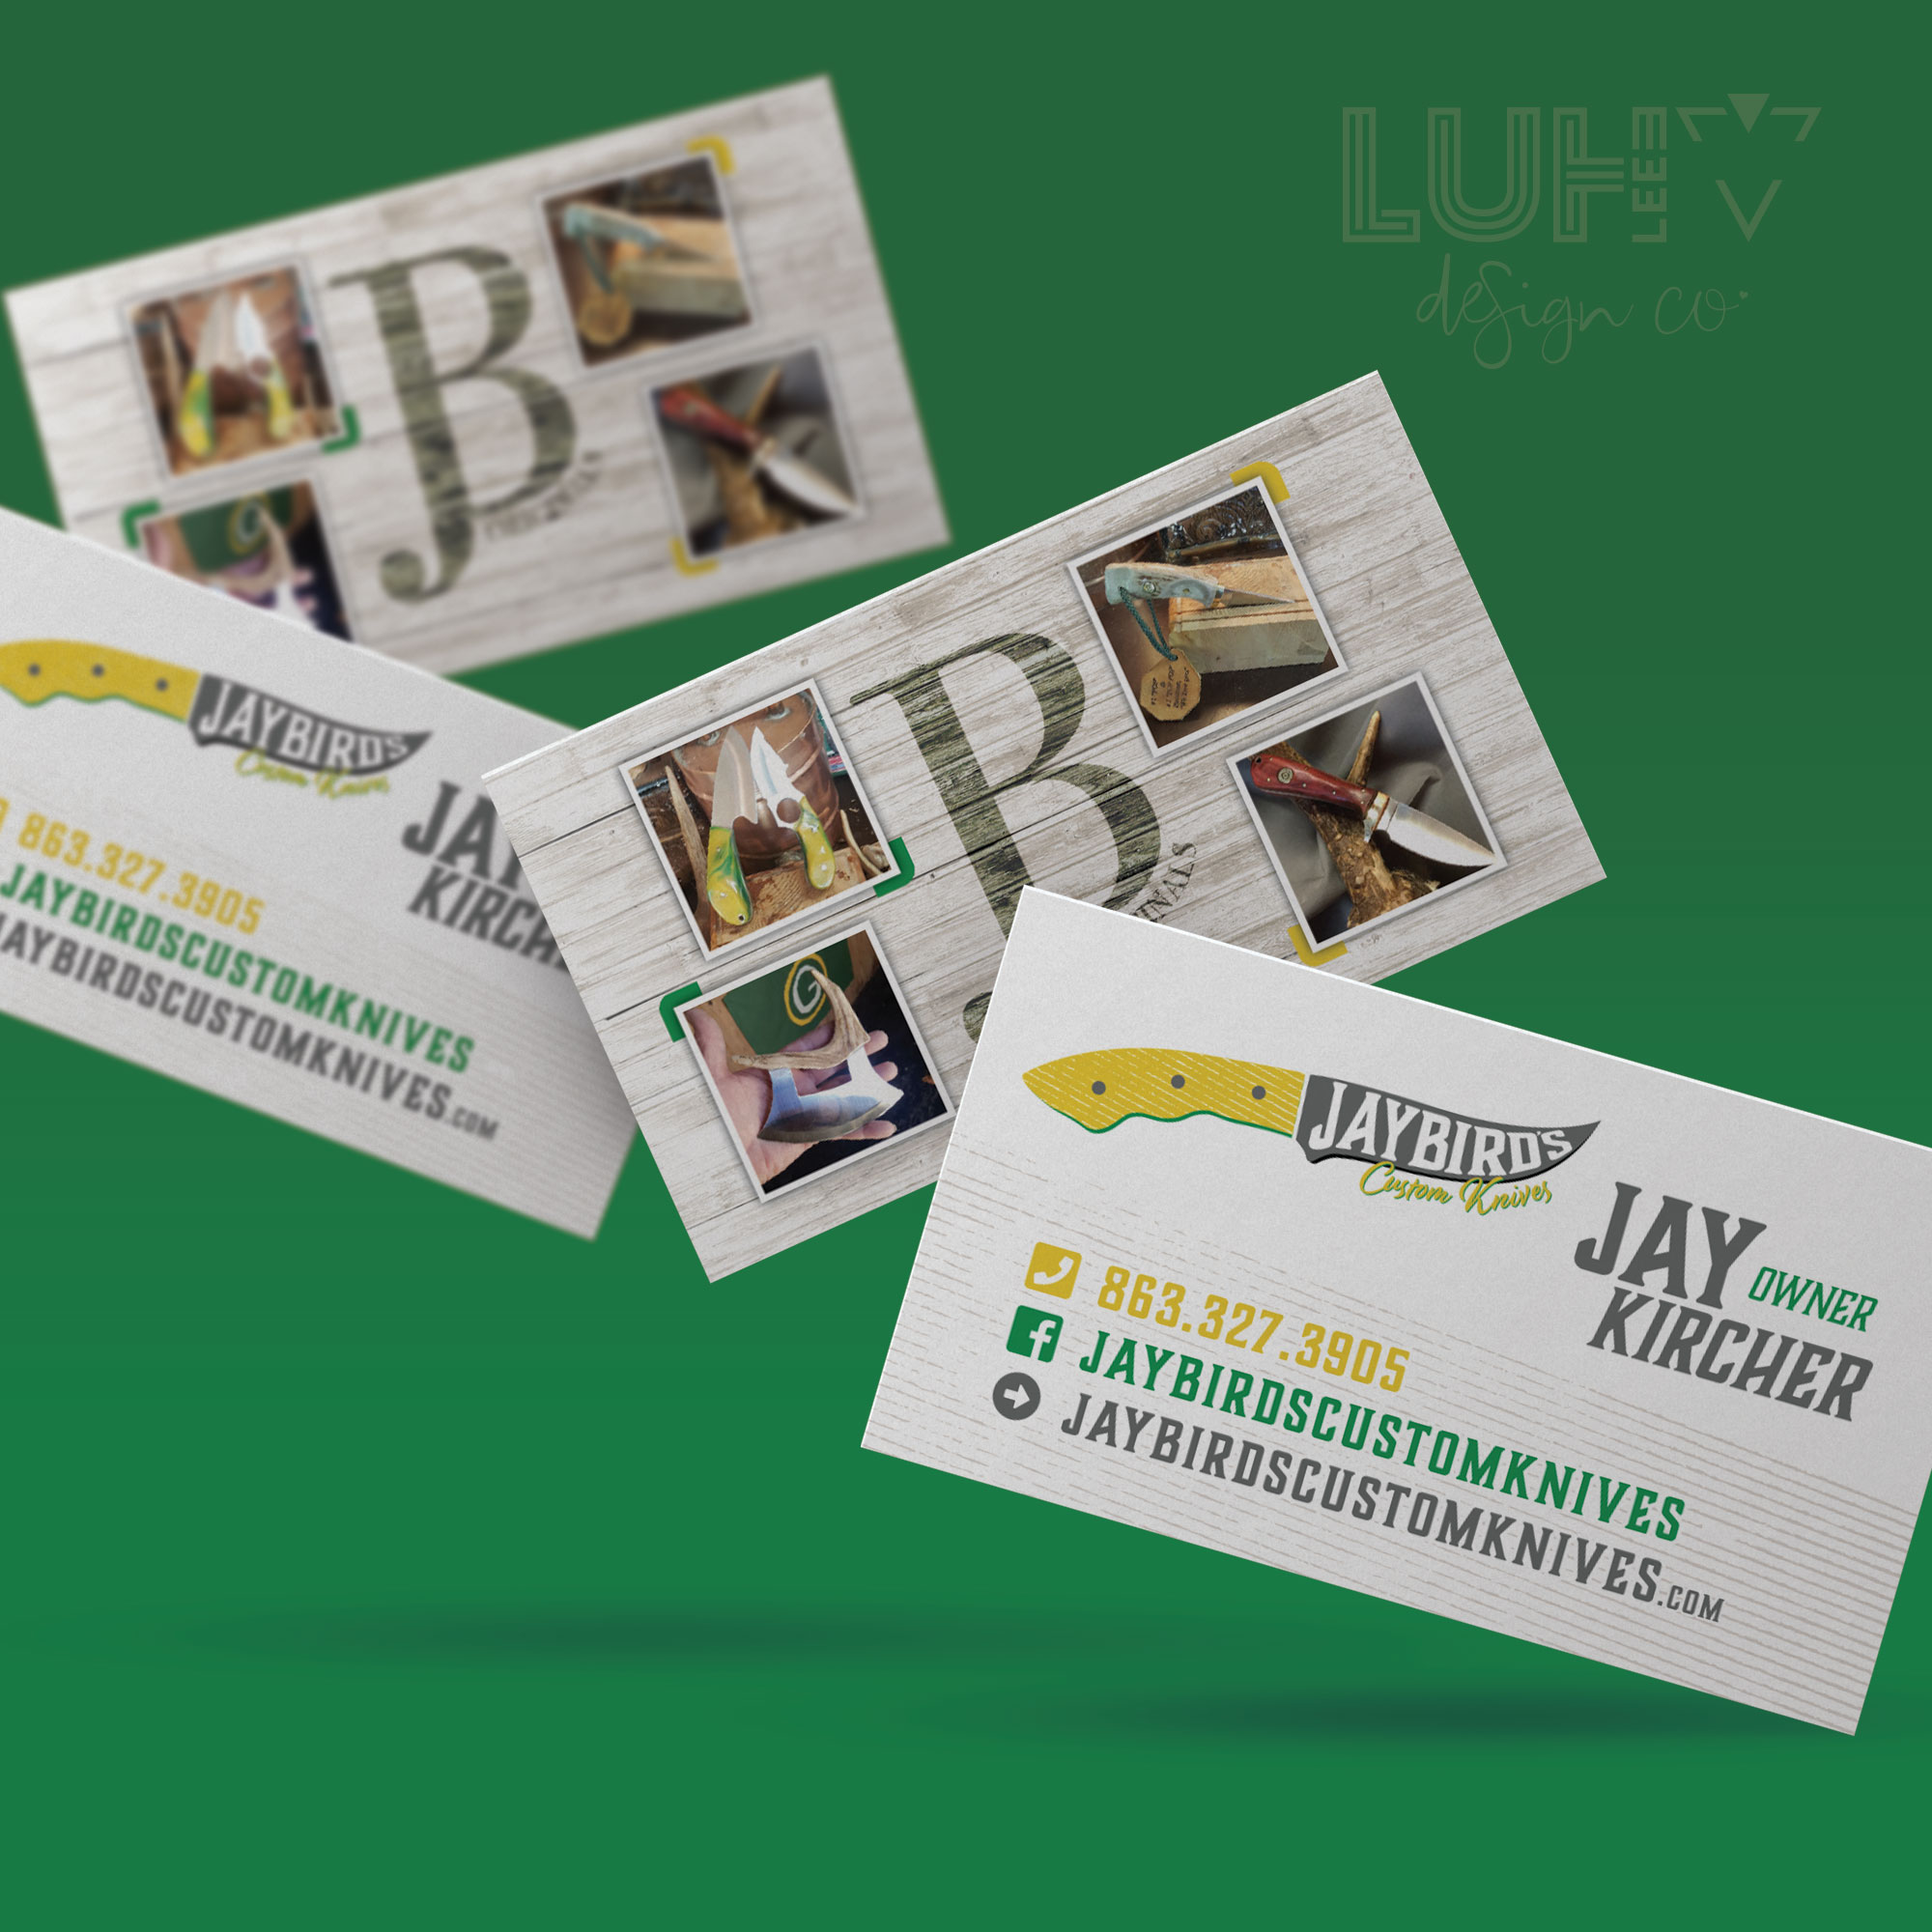 Jaybirds-Business-Cards.jpg